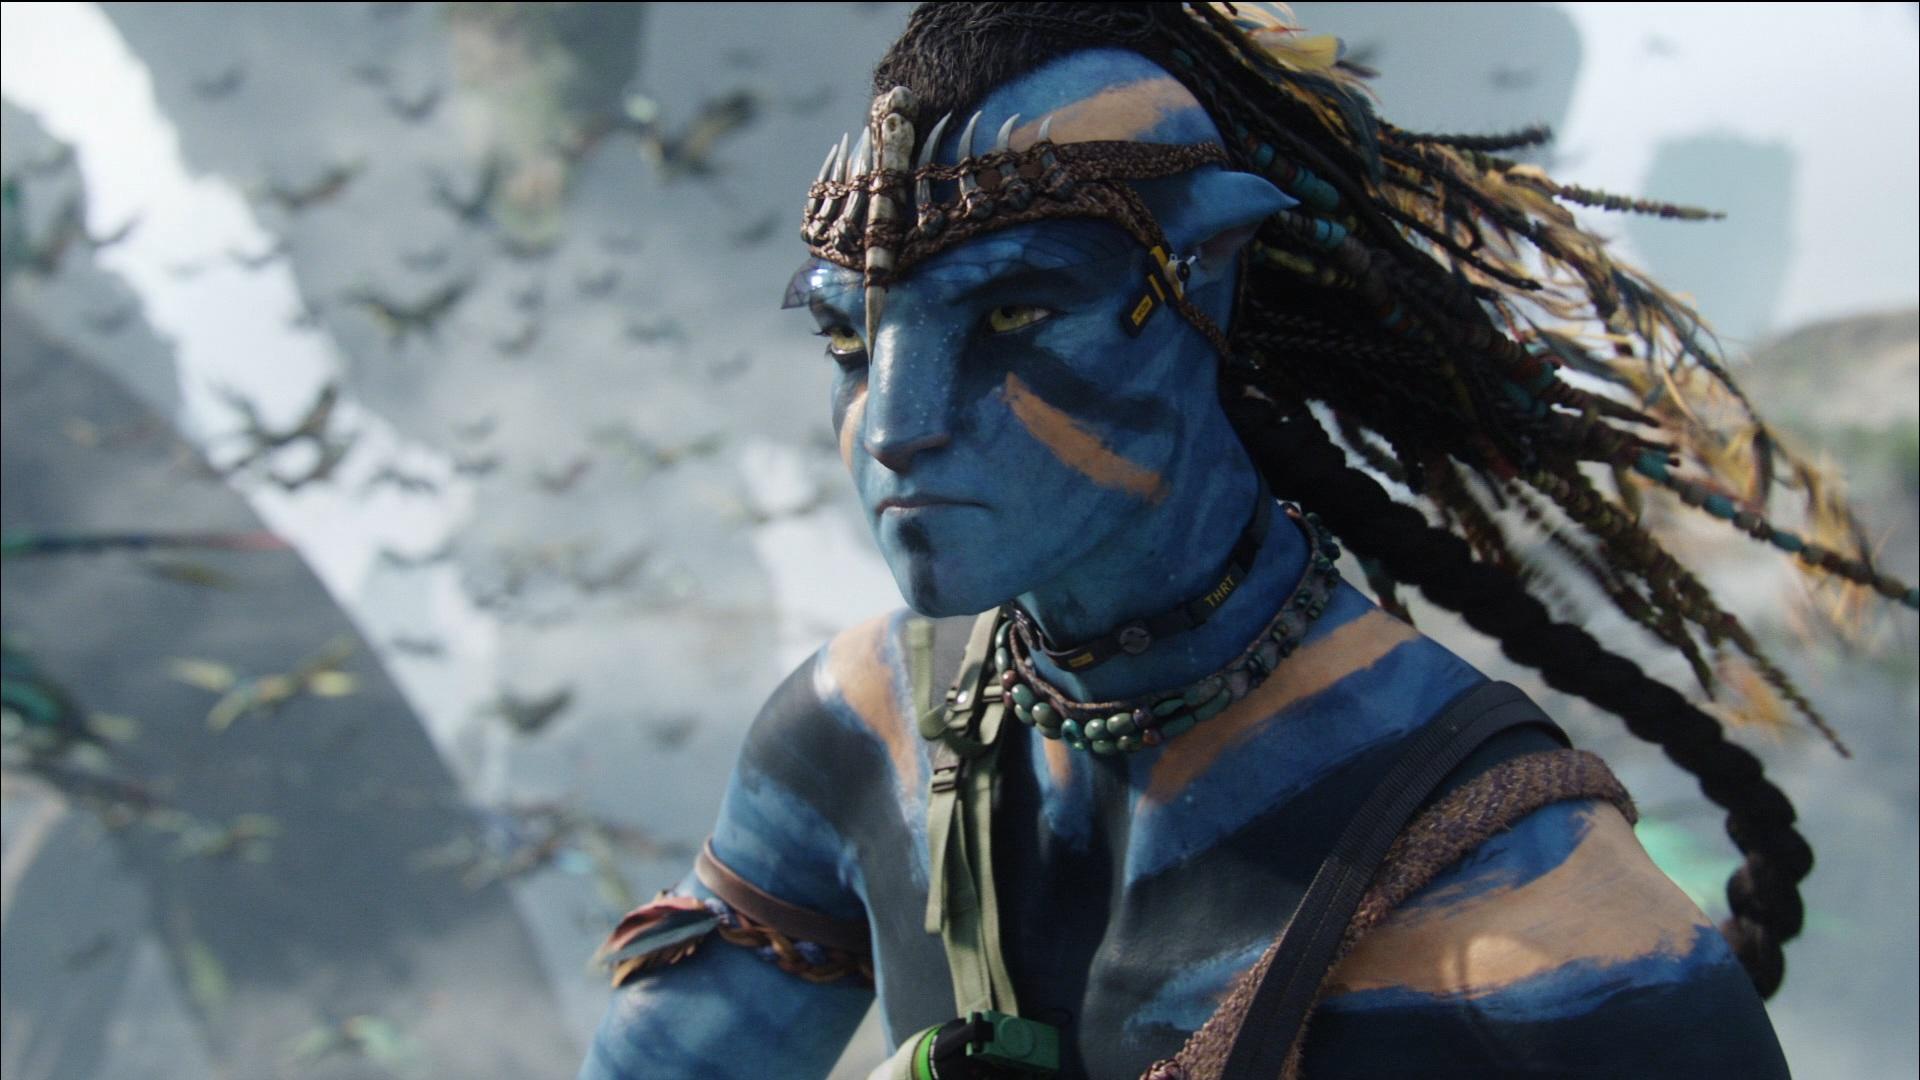 Avatar Porno Pelicula avatar', de james cameron: 'en la piel del indígena' vs